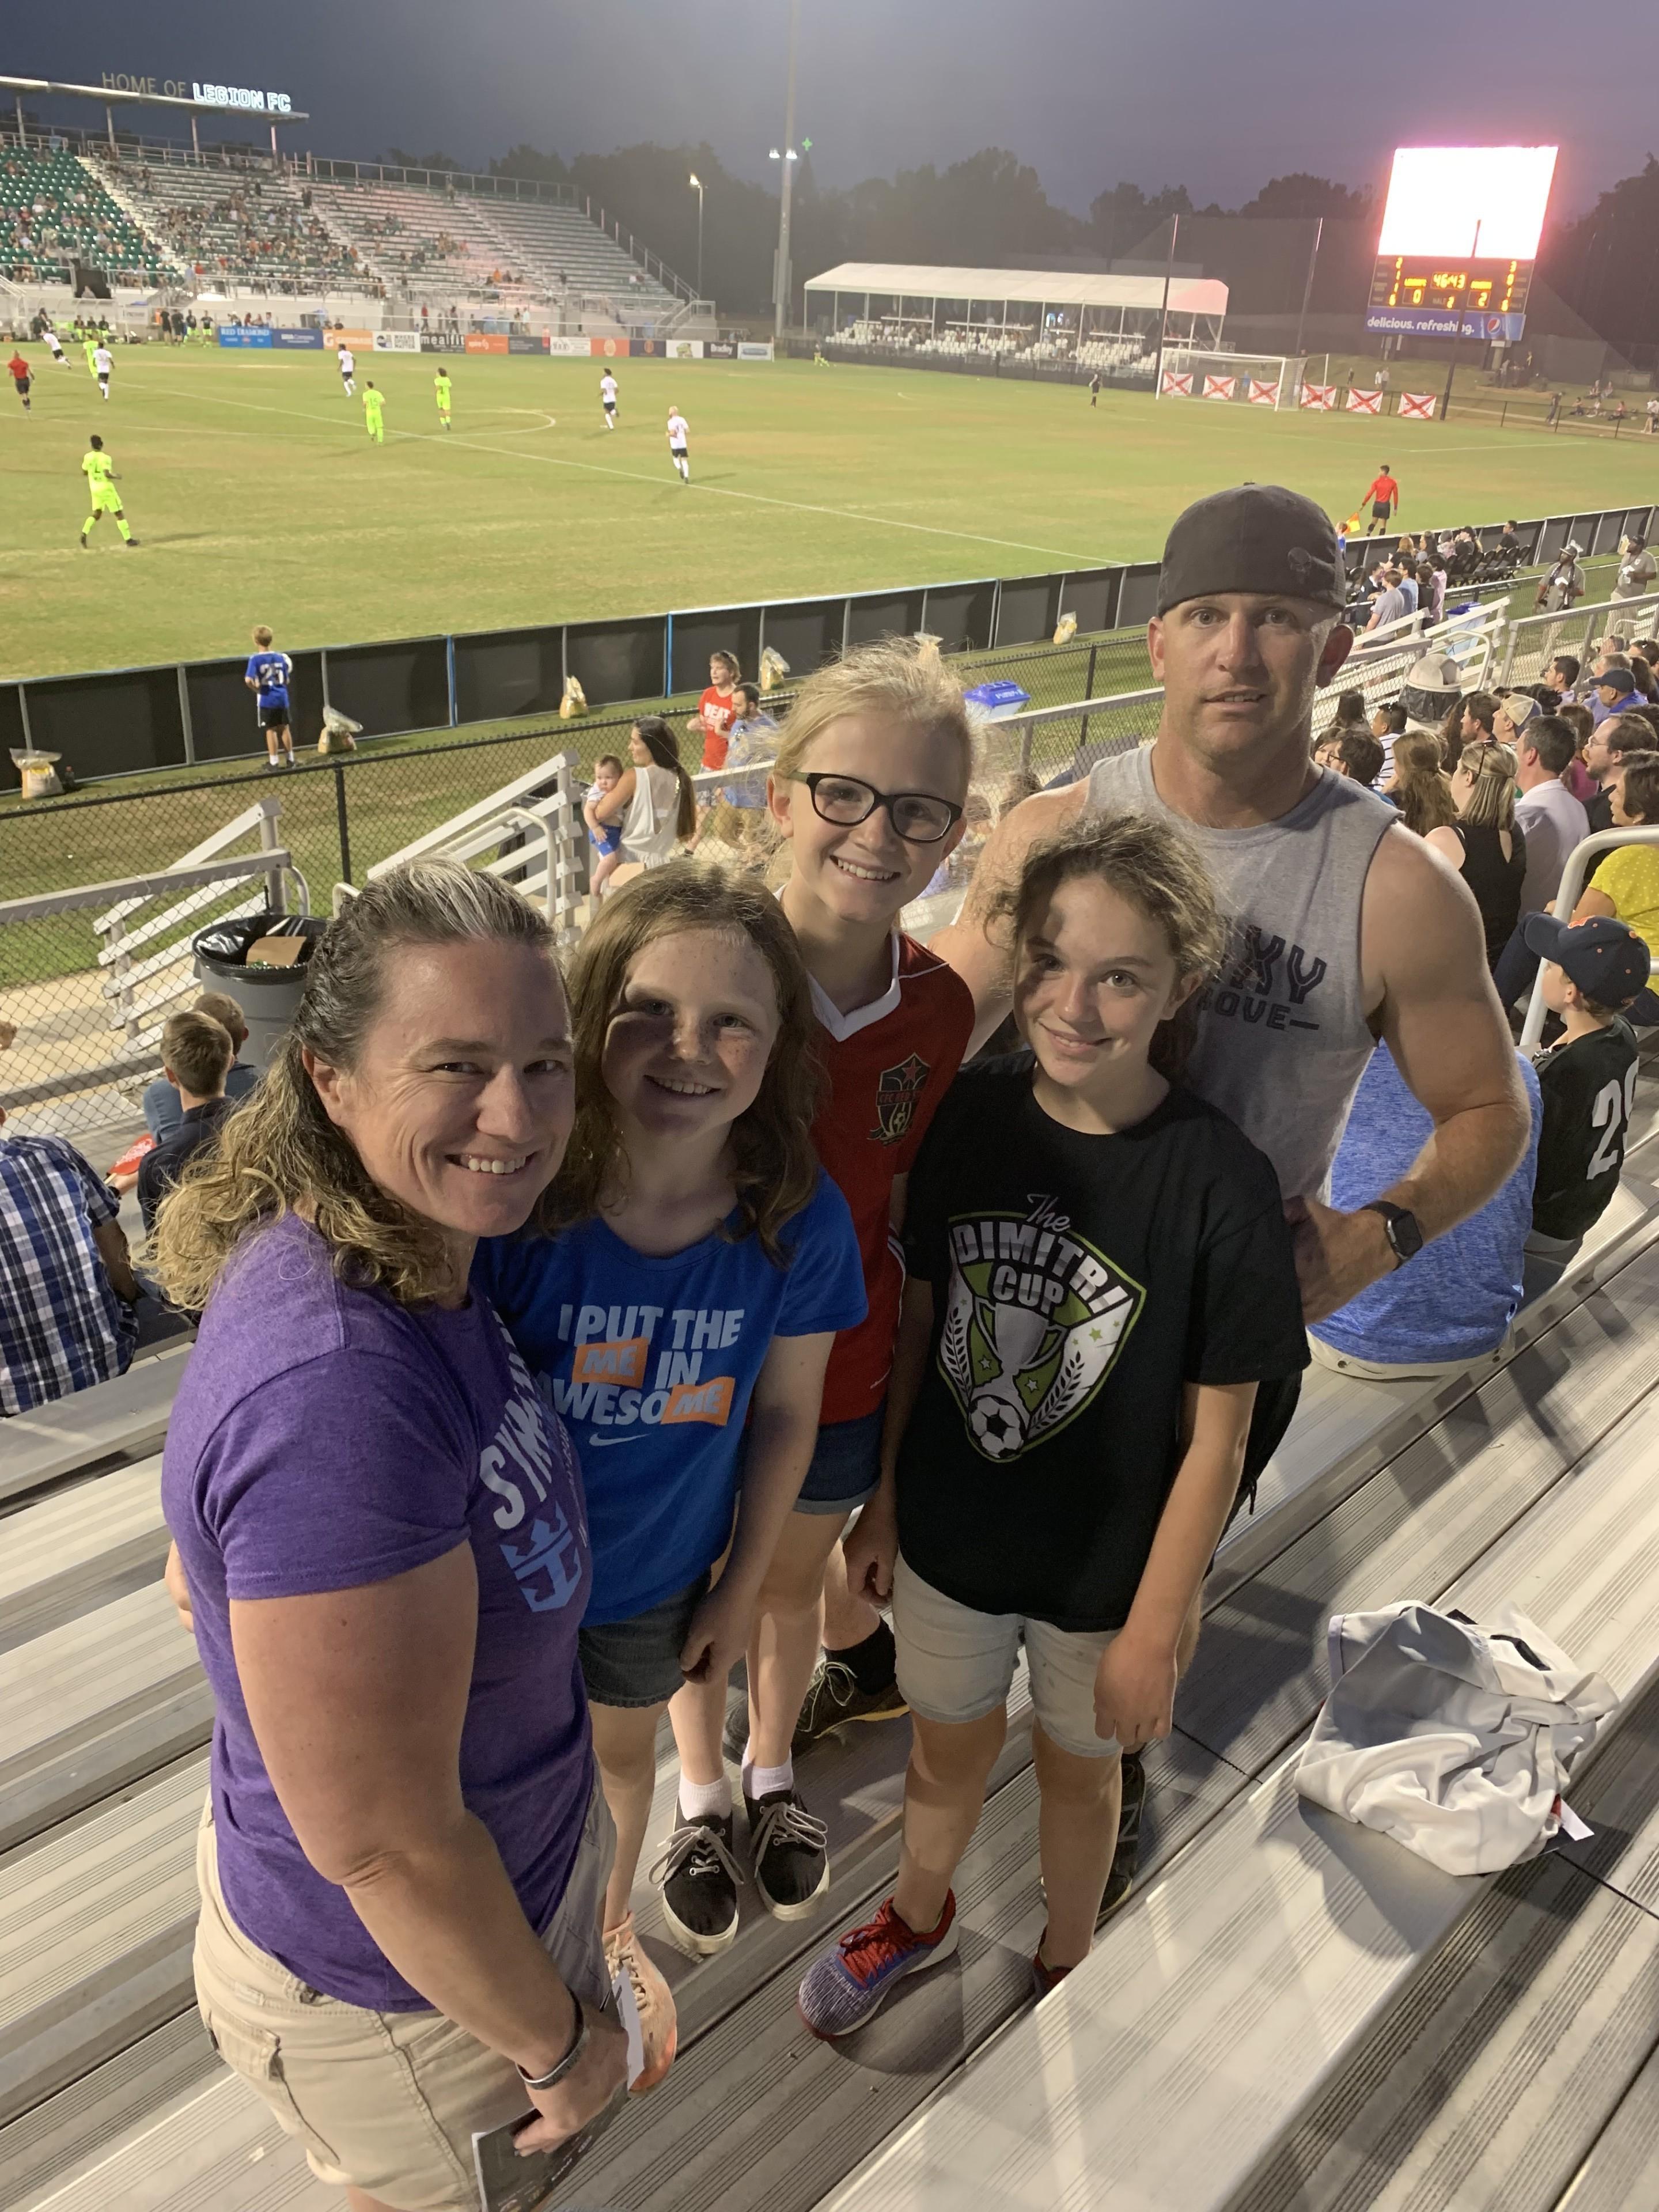 d1cebe320ca DREW attended Birmingham Legion FC vs. Tampa Bay Rowdies - USL on Jun 1st  2019